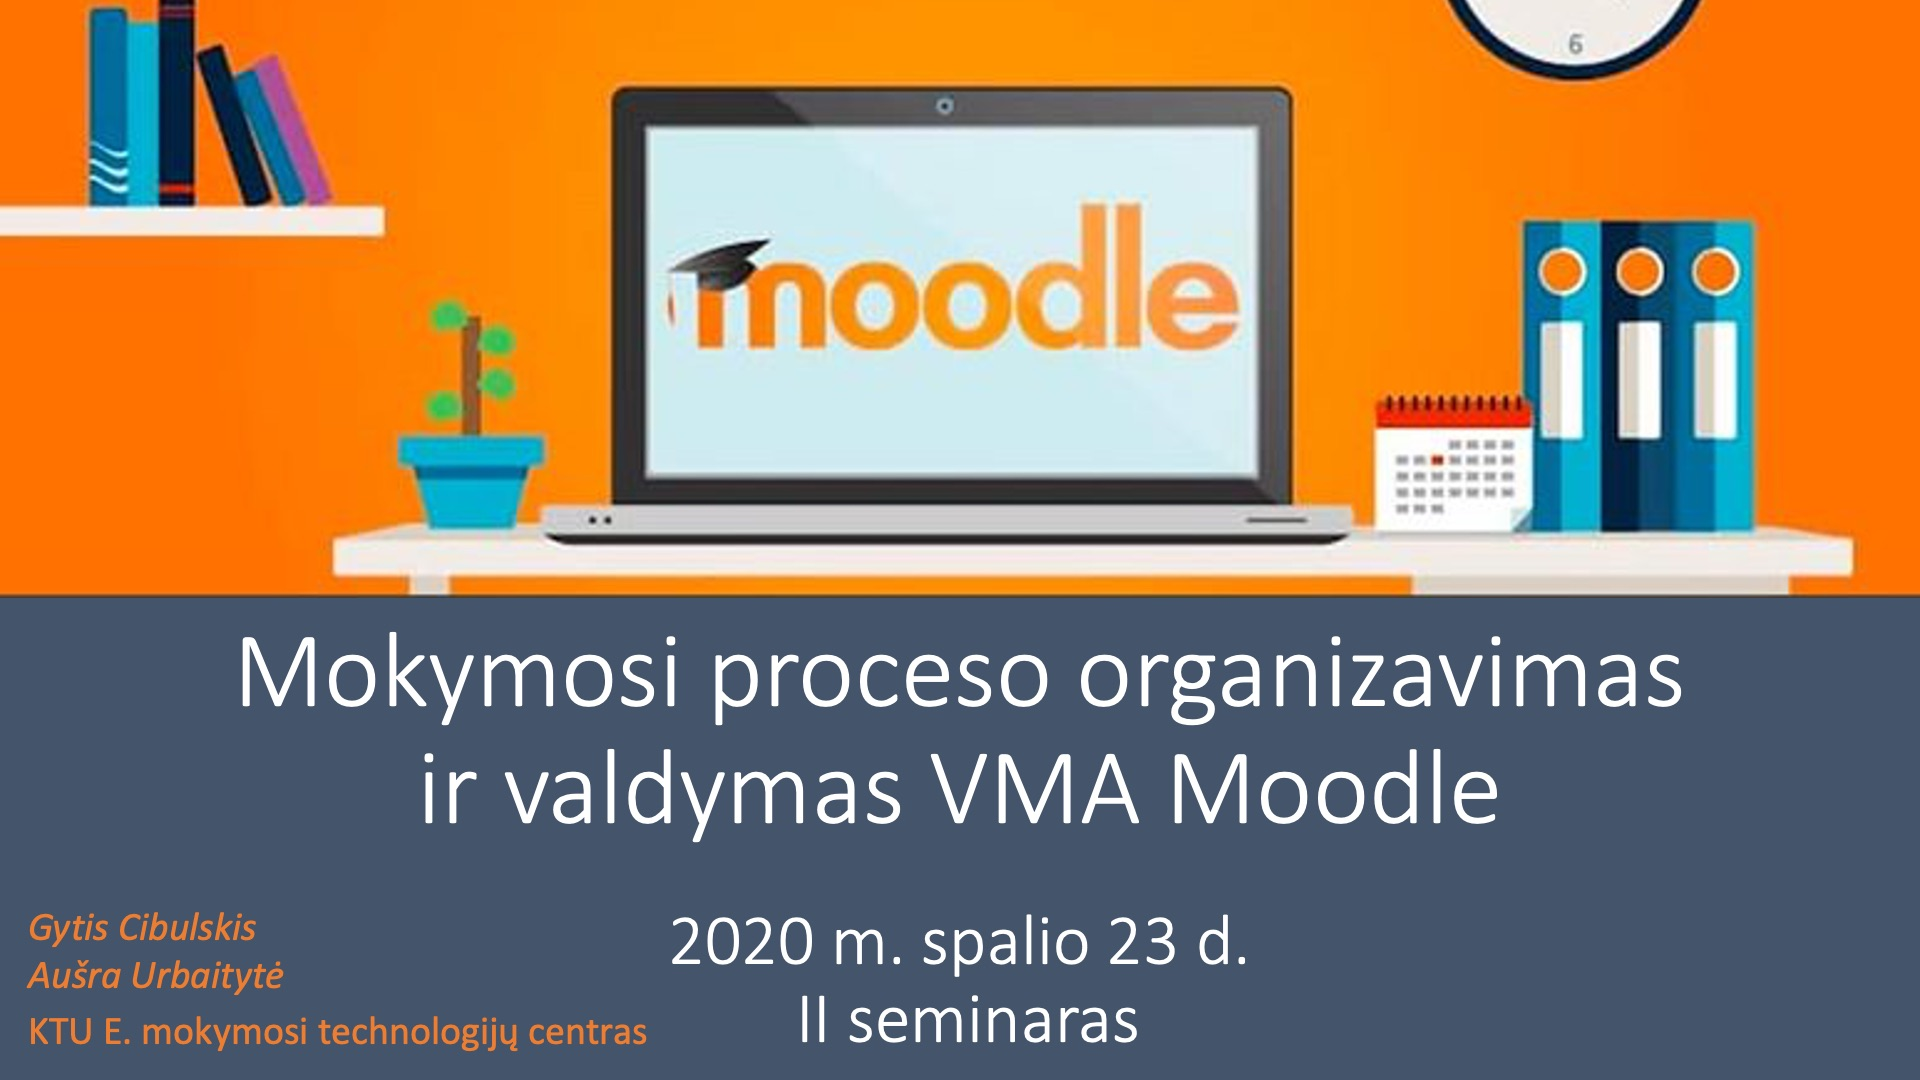 2020.10.23 Moodle mokymai (II seminaras)